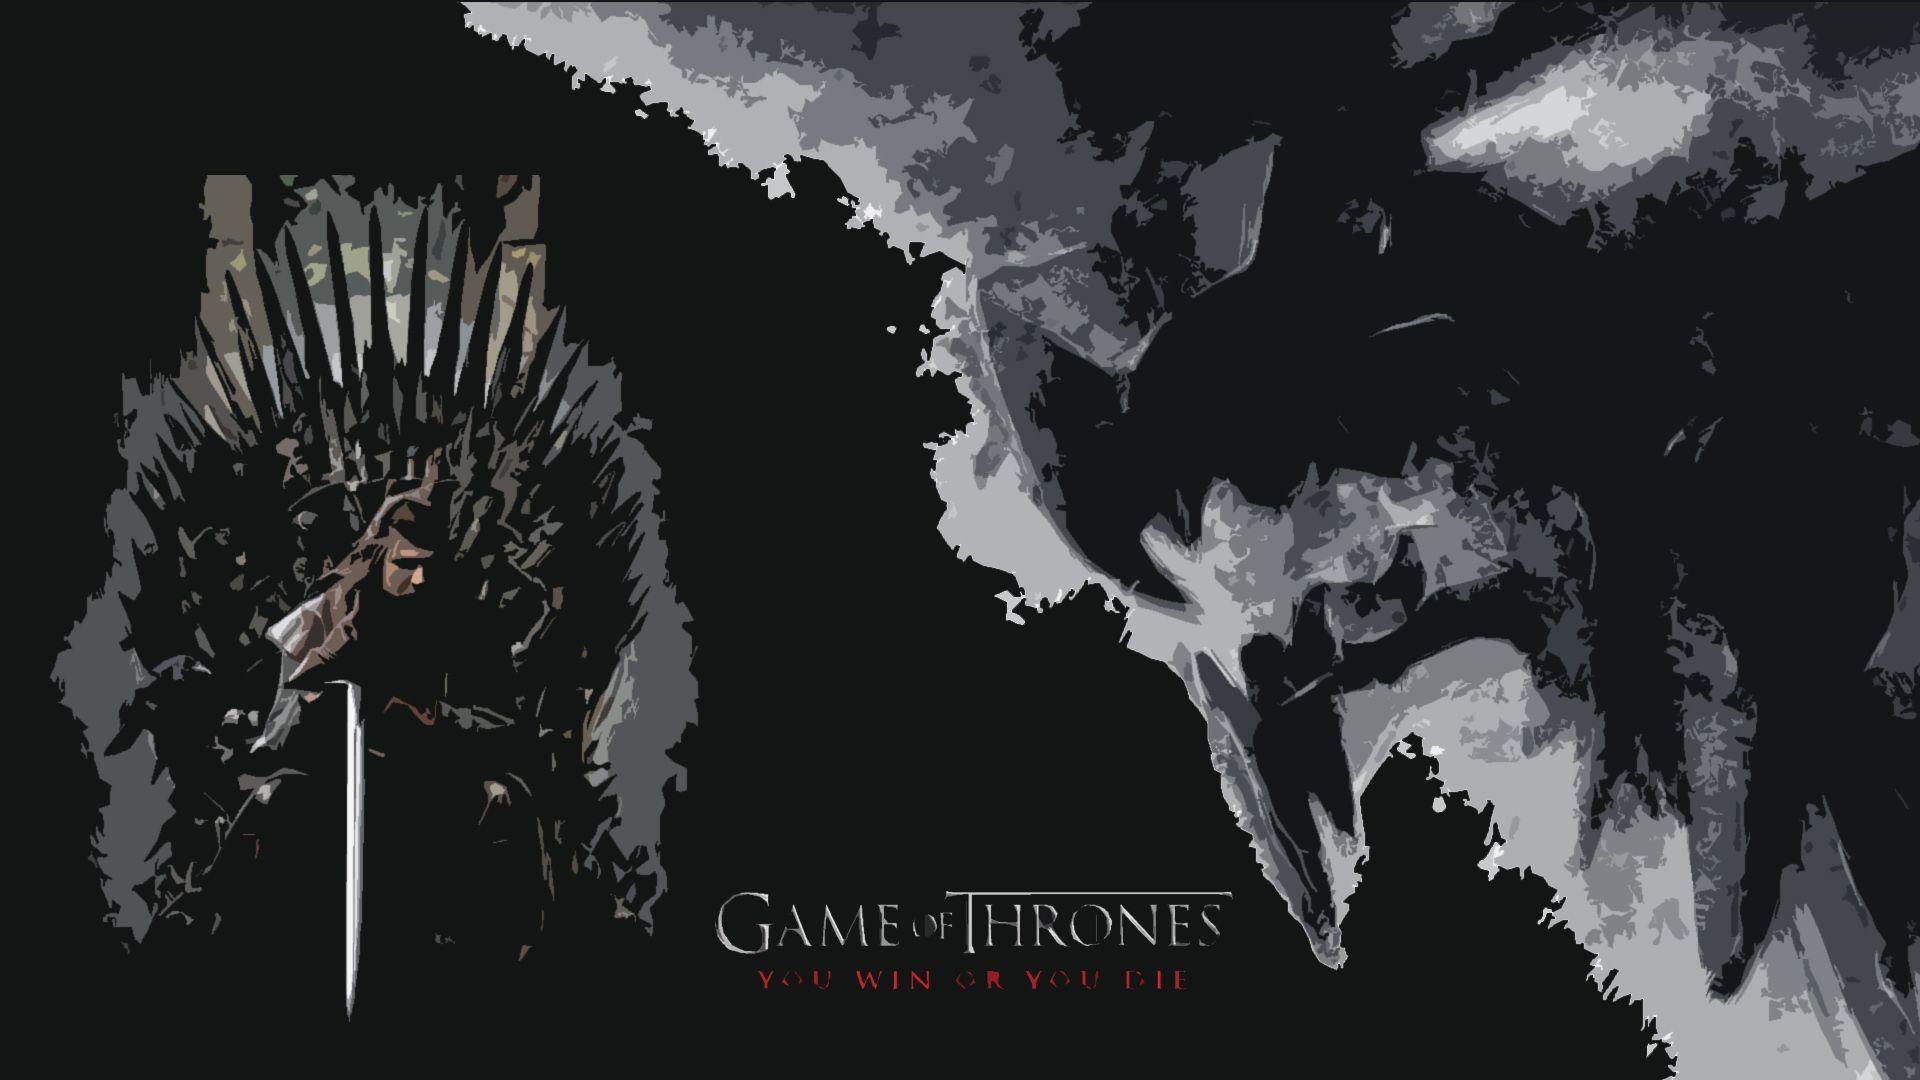 Game Of Thrones Art Wallpapers Top Free Game Of Thrones Art